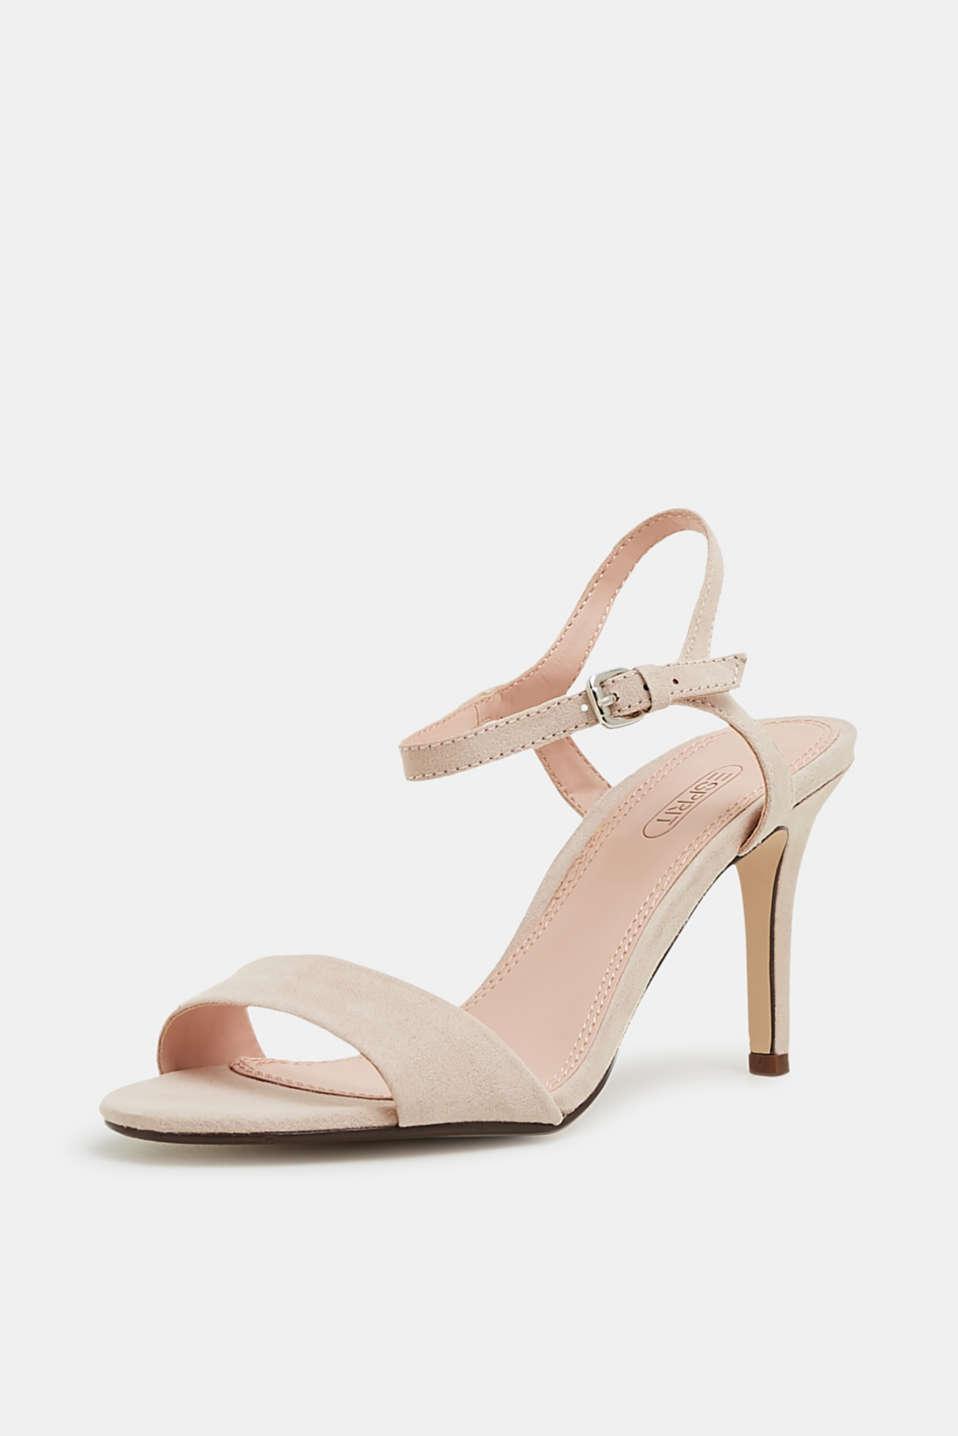 Faux suede sandals, SKIN BEIGE 2, detail image number 2